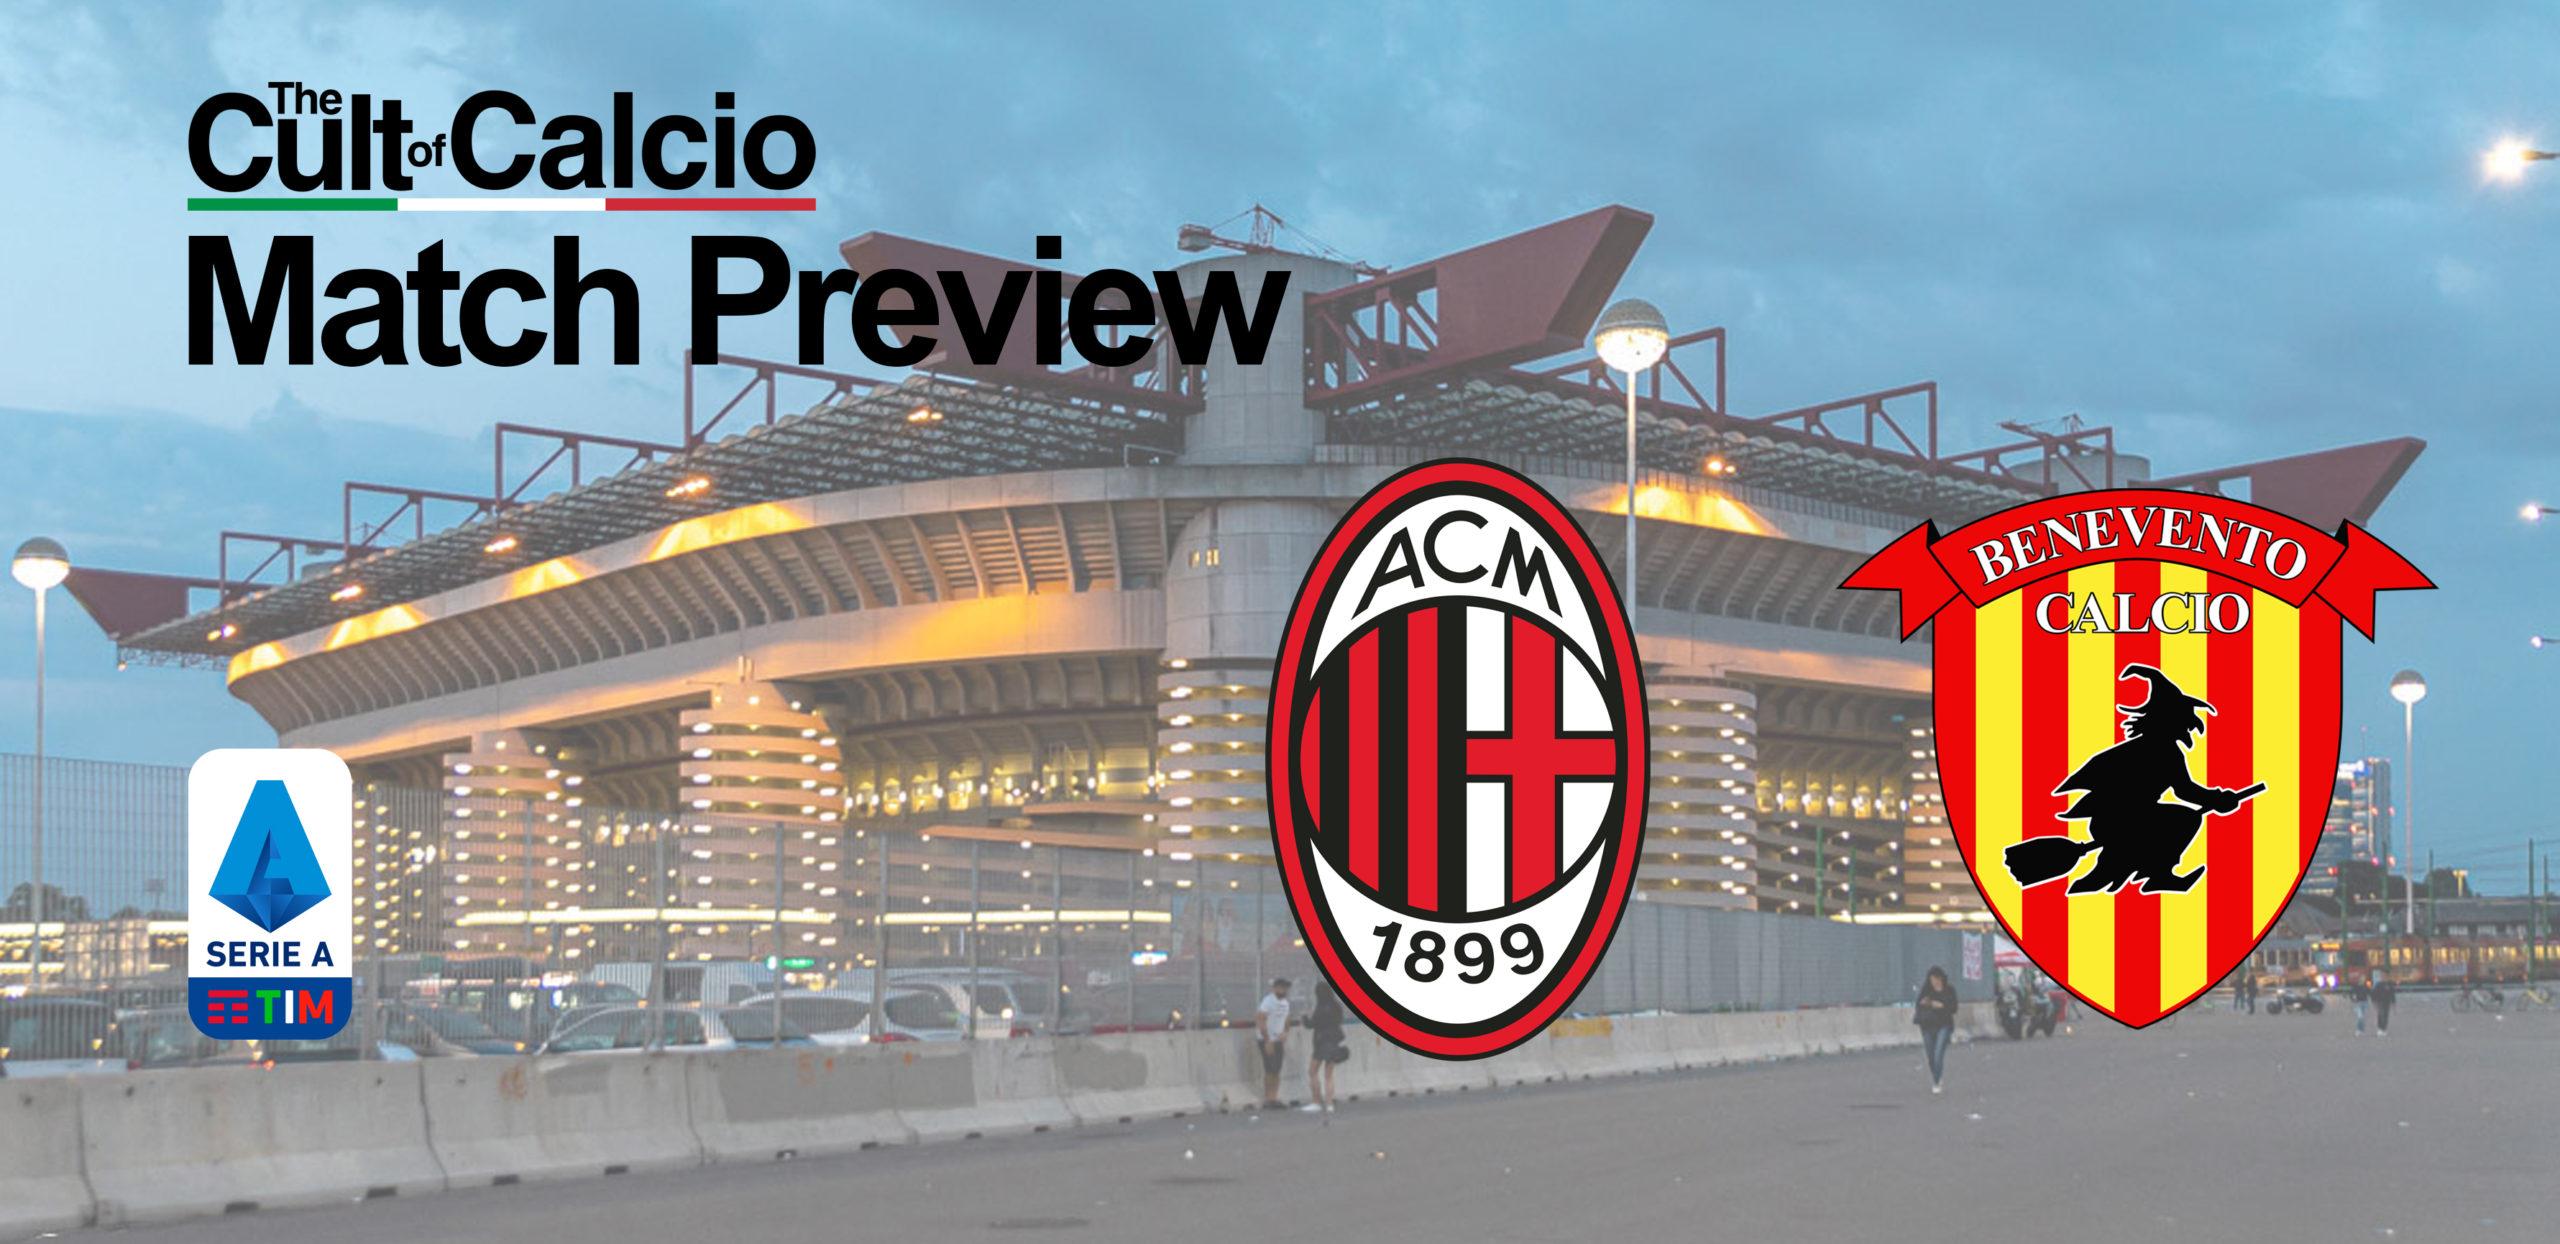 Serie A Matchday 34: Milan - Benevento Match Preview - The Cult of Calcio